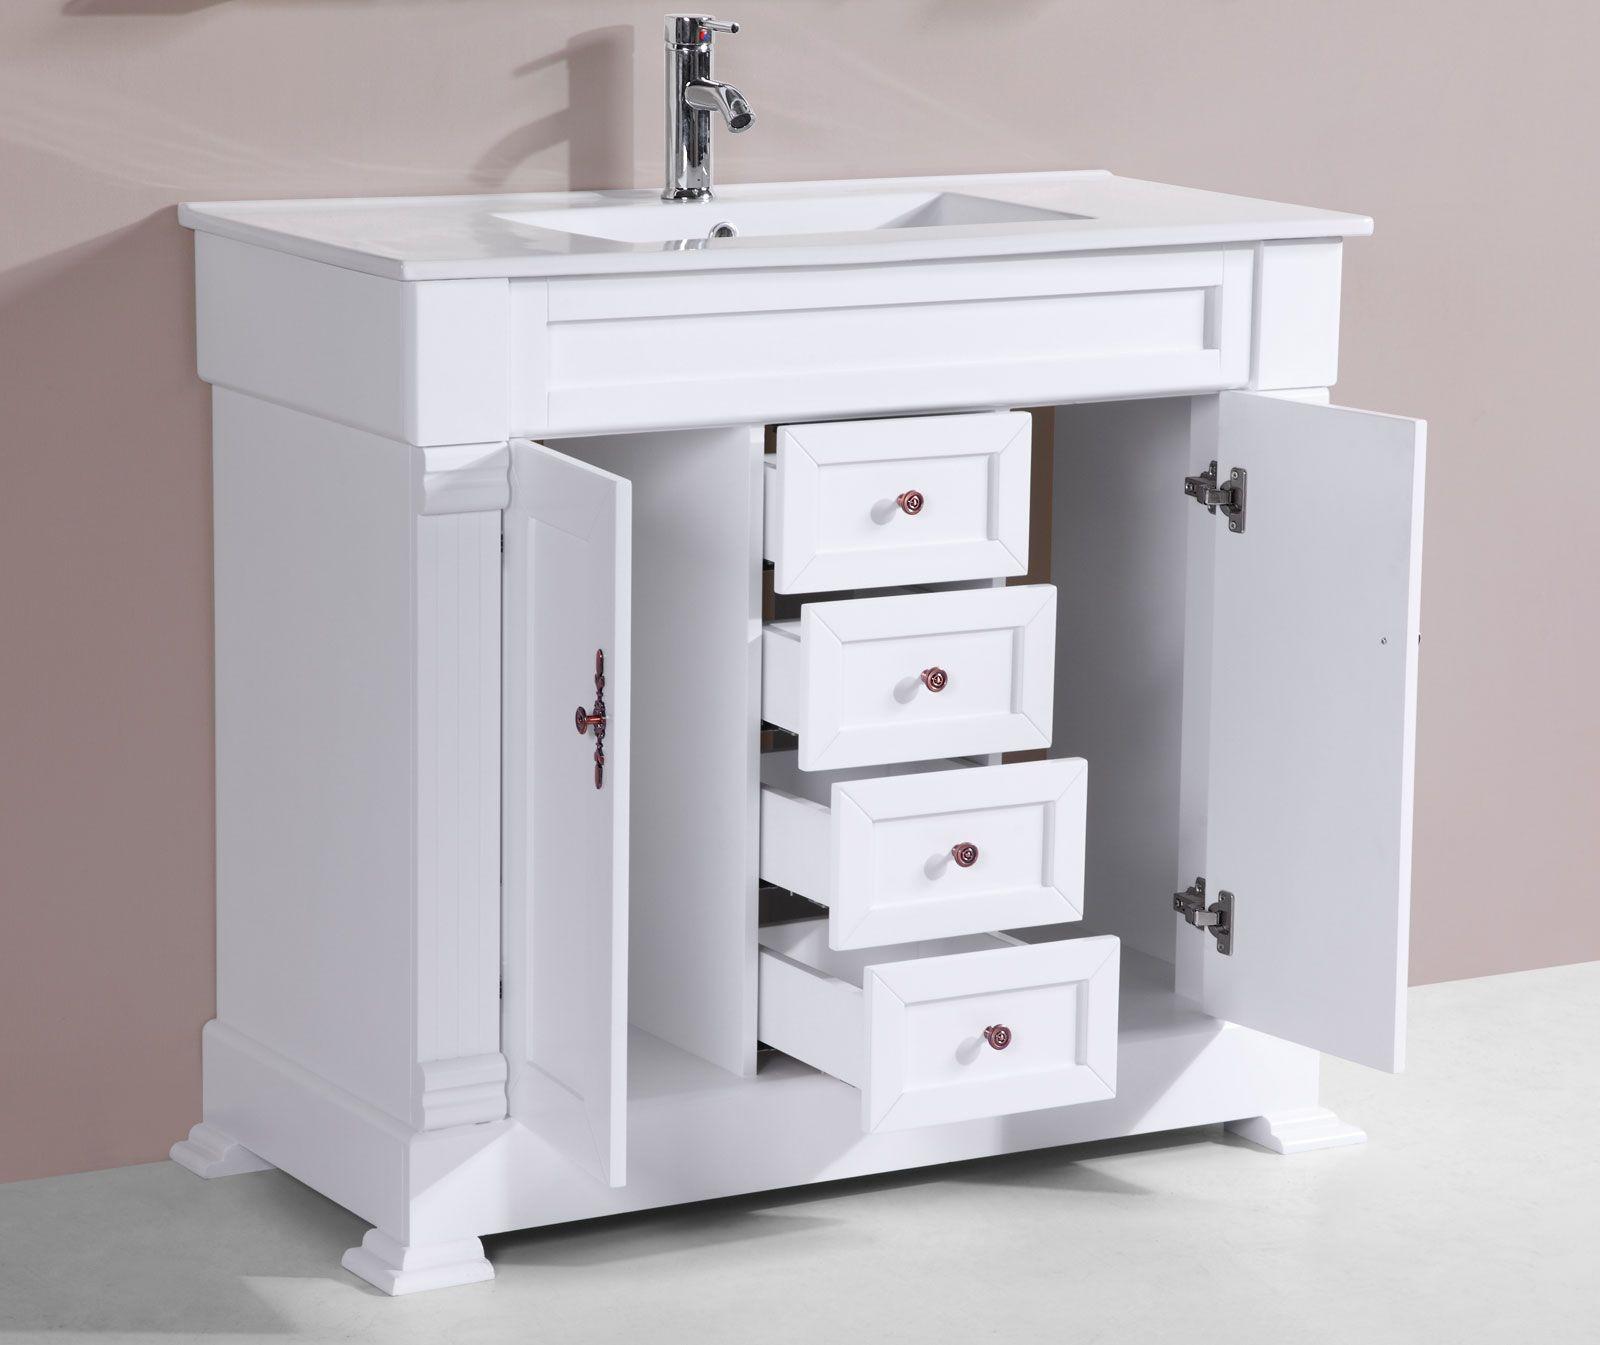 pinrussell turner on bathroom ideas  home depot